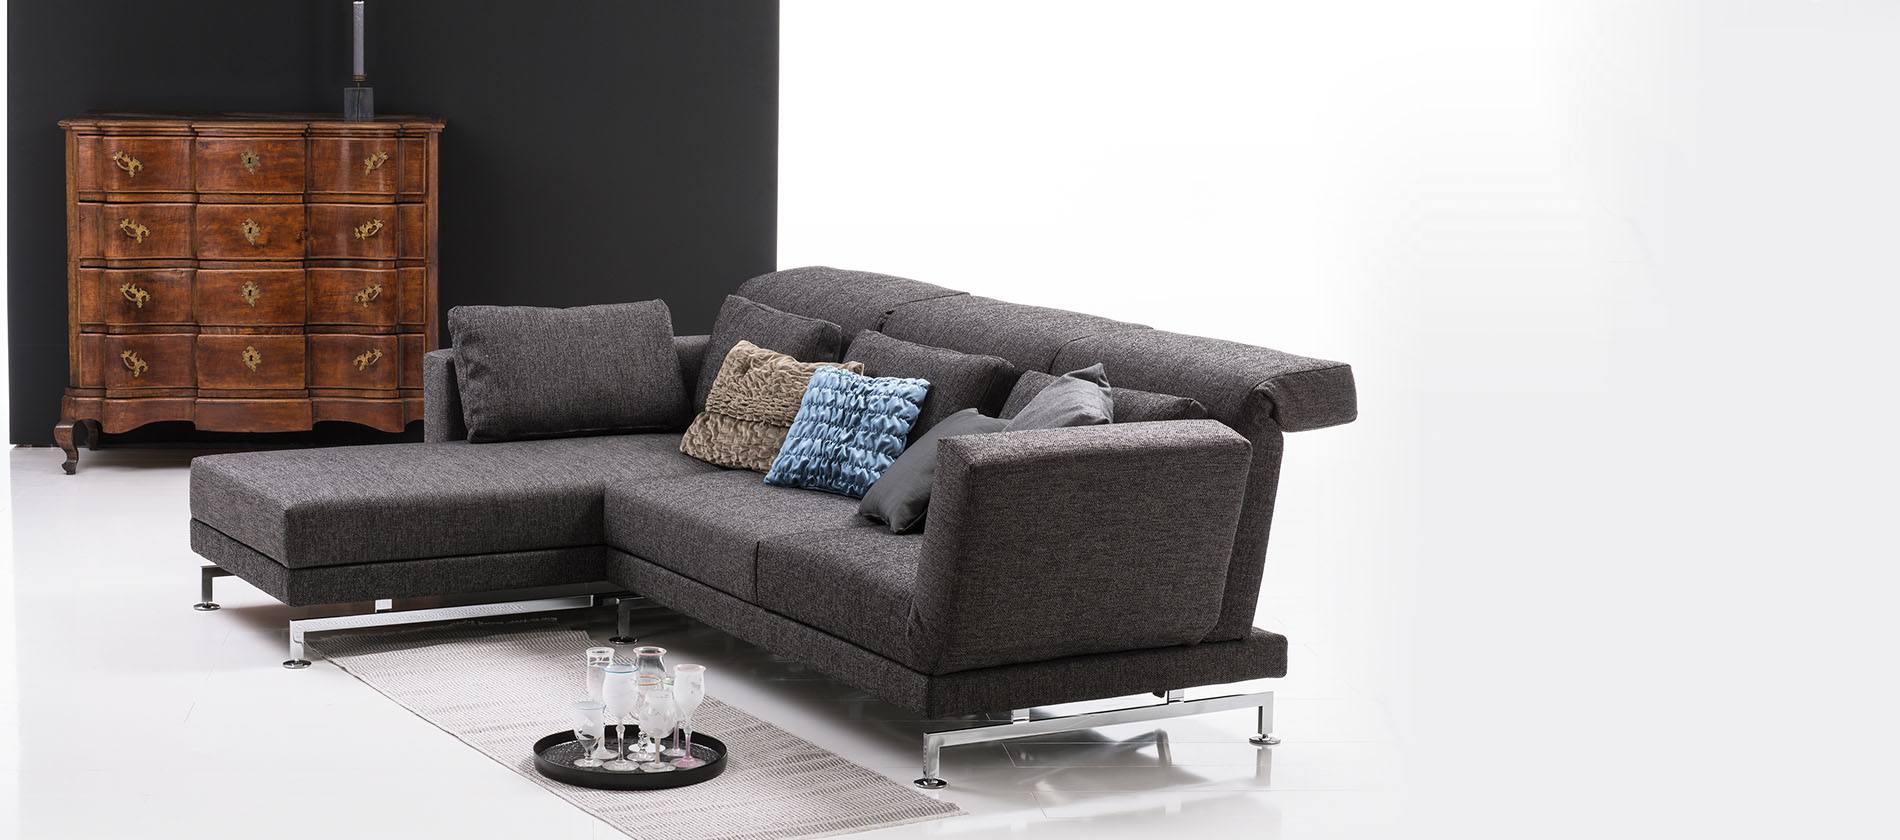 Inspirierend Sofa Mit Abnehmbaren Bezug Foto Von Brühl Moule Ecksofa Funktion